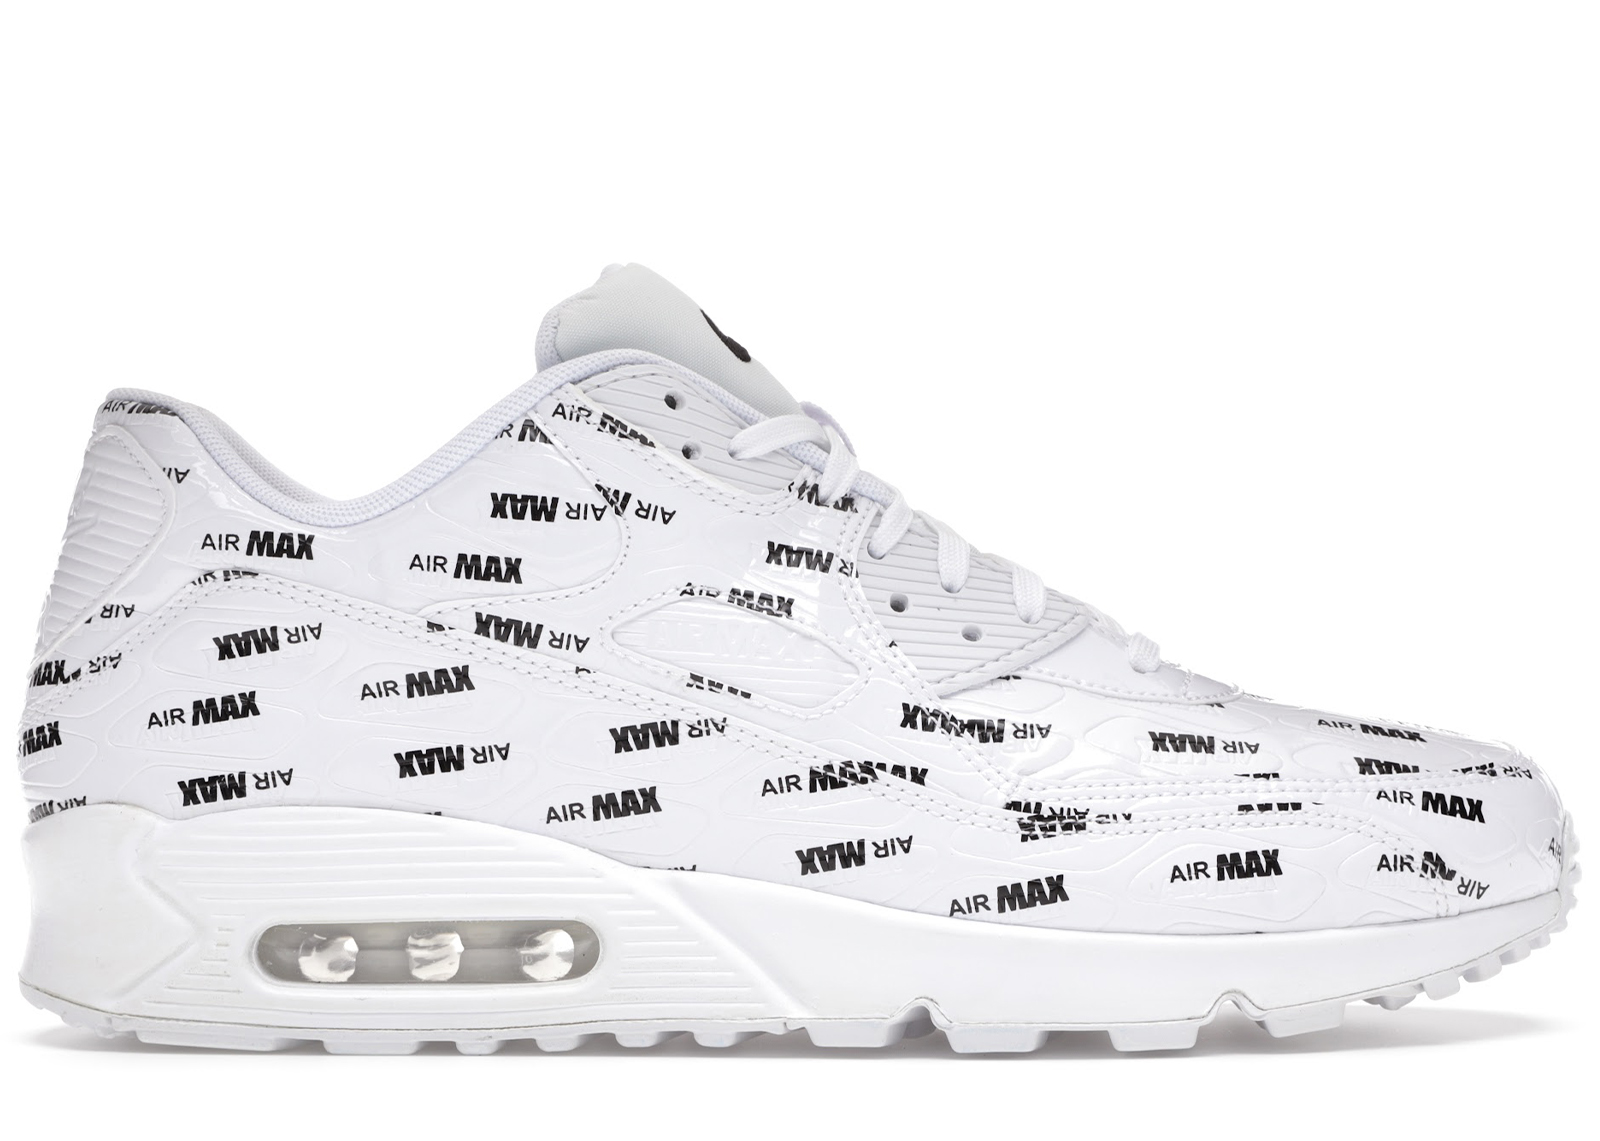 Nike Air Max 90 All Over Print White Black